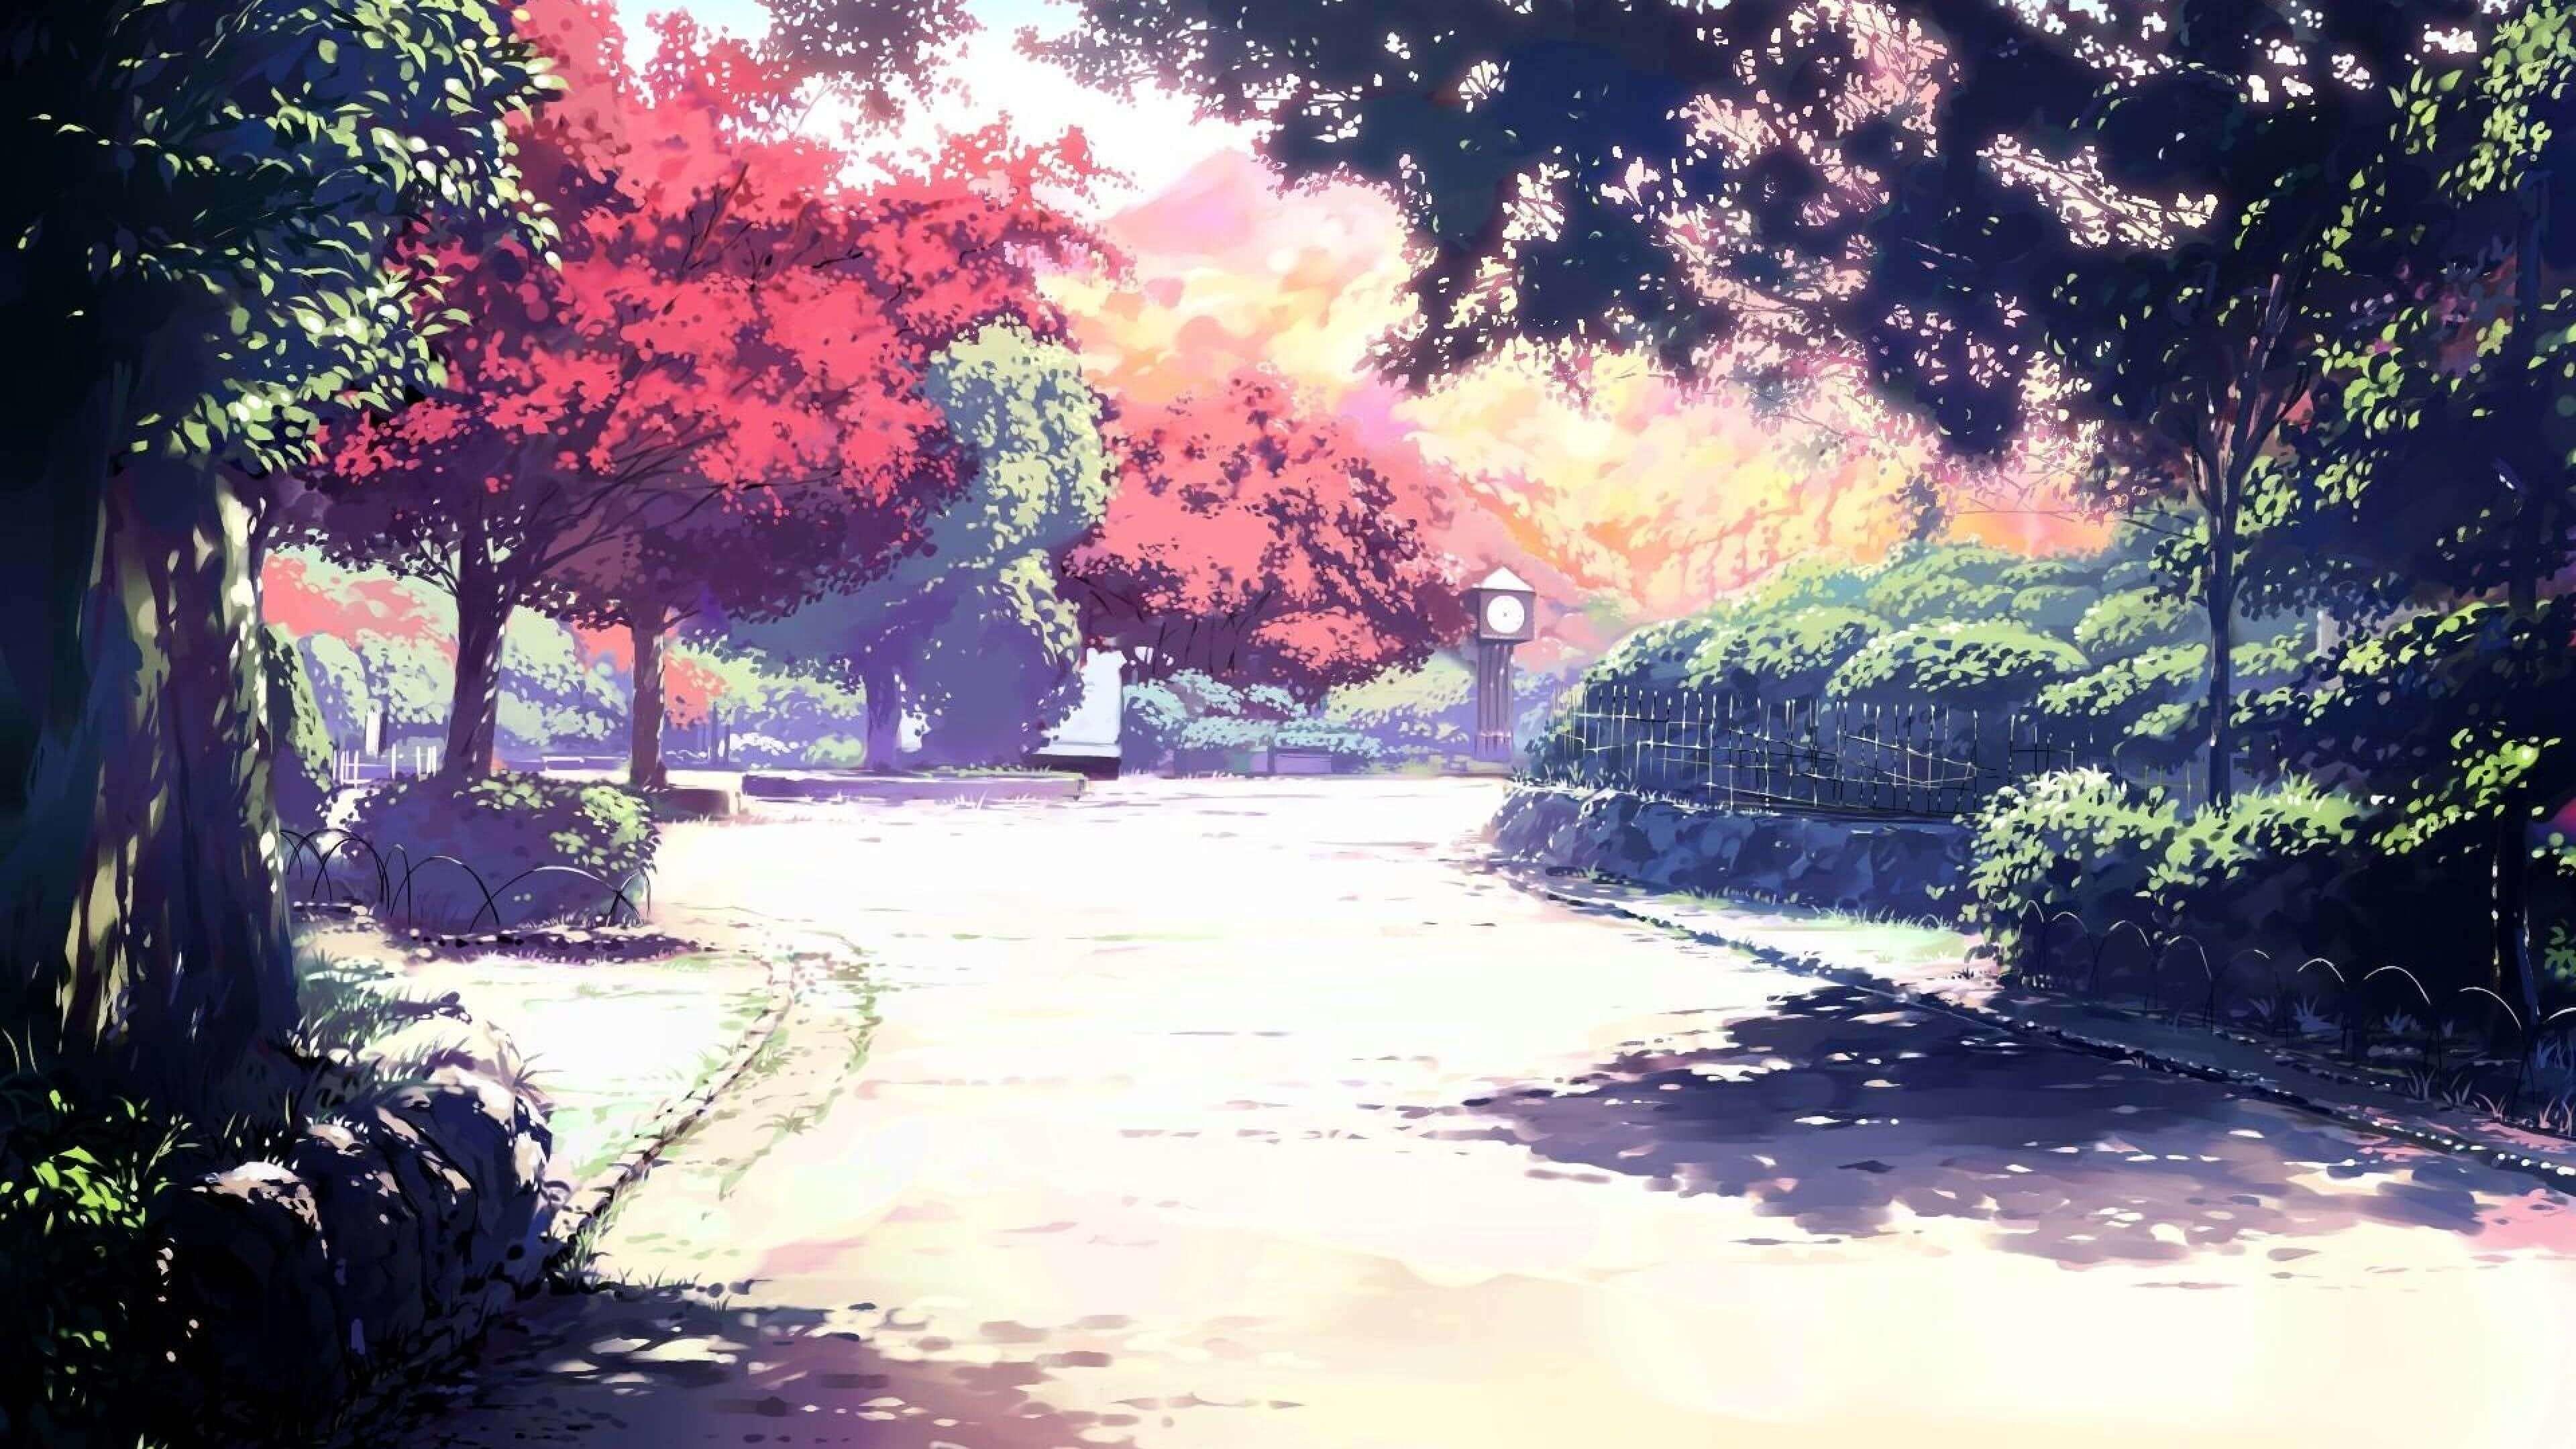 1920x1080 Anime Scenery Boy Under Tree Wallpapers